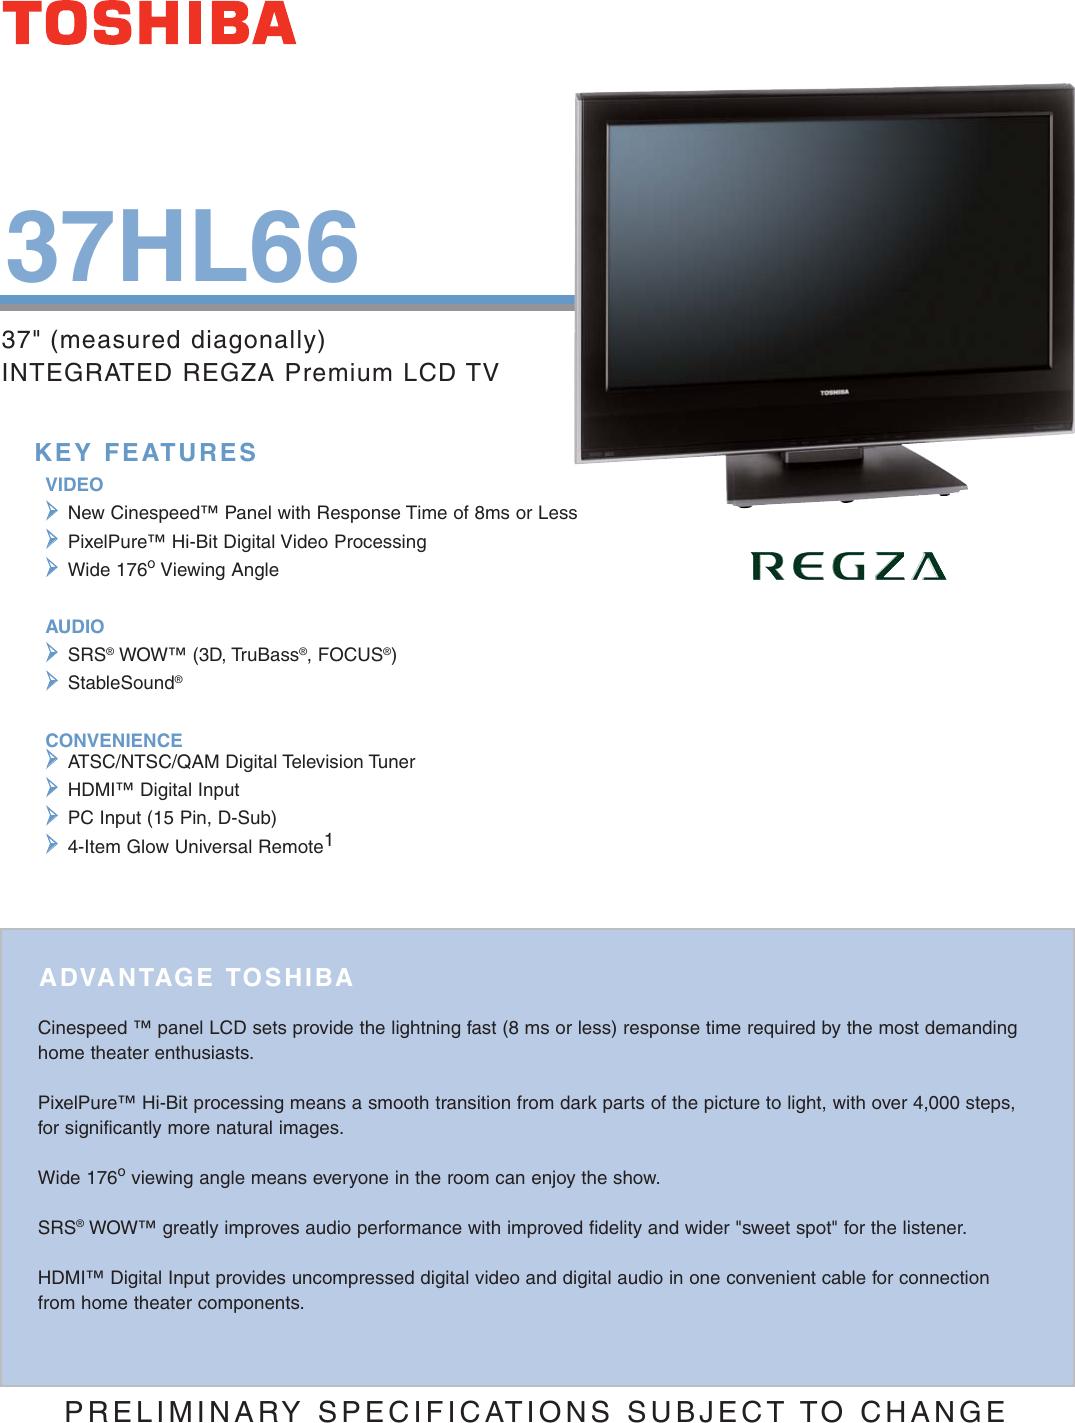 Toshiba Regza 37Hl66 Users Manual 37HL66sell